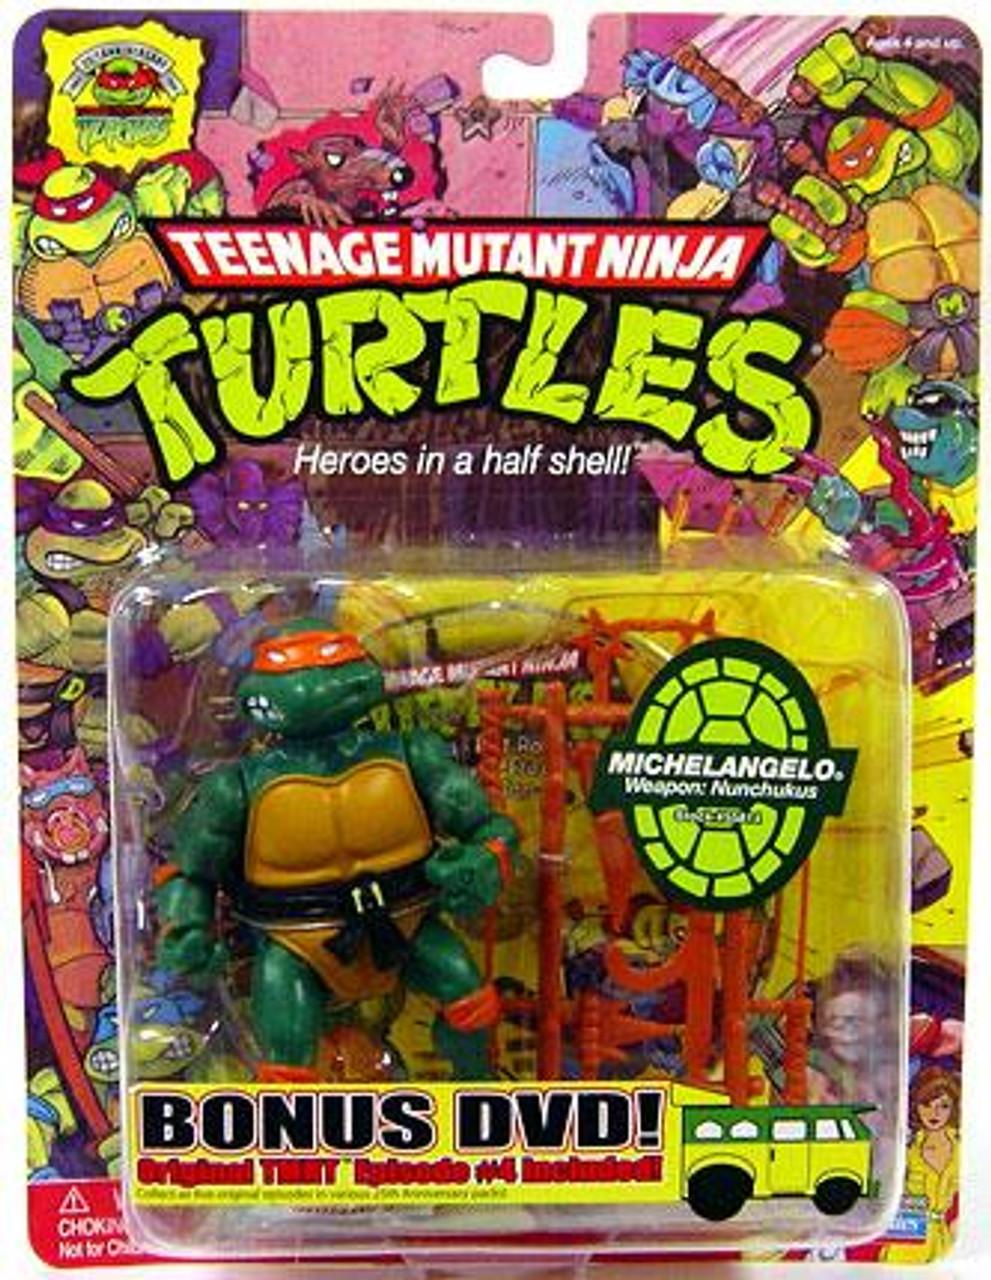 Teenage Mutant Ninja Turtles 1987 25th Anniversary Michelangelo Action Figure